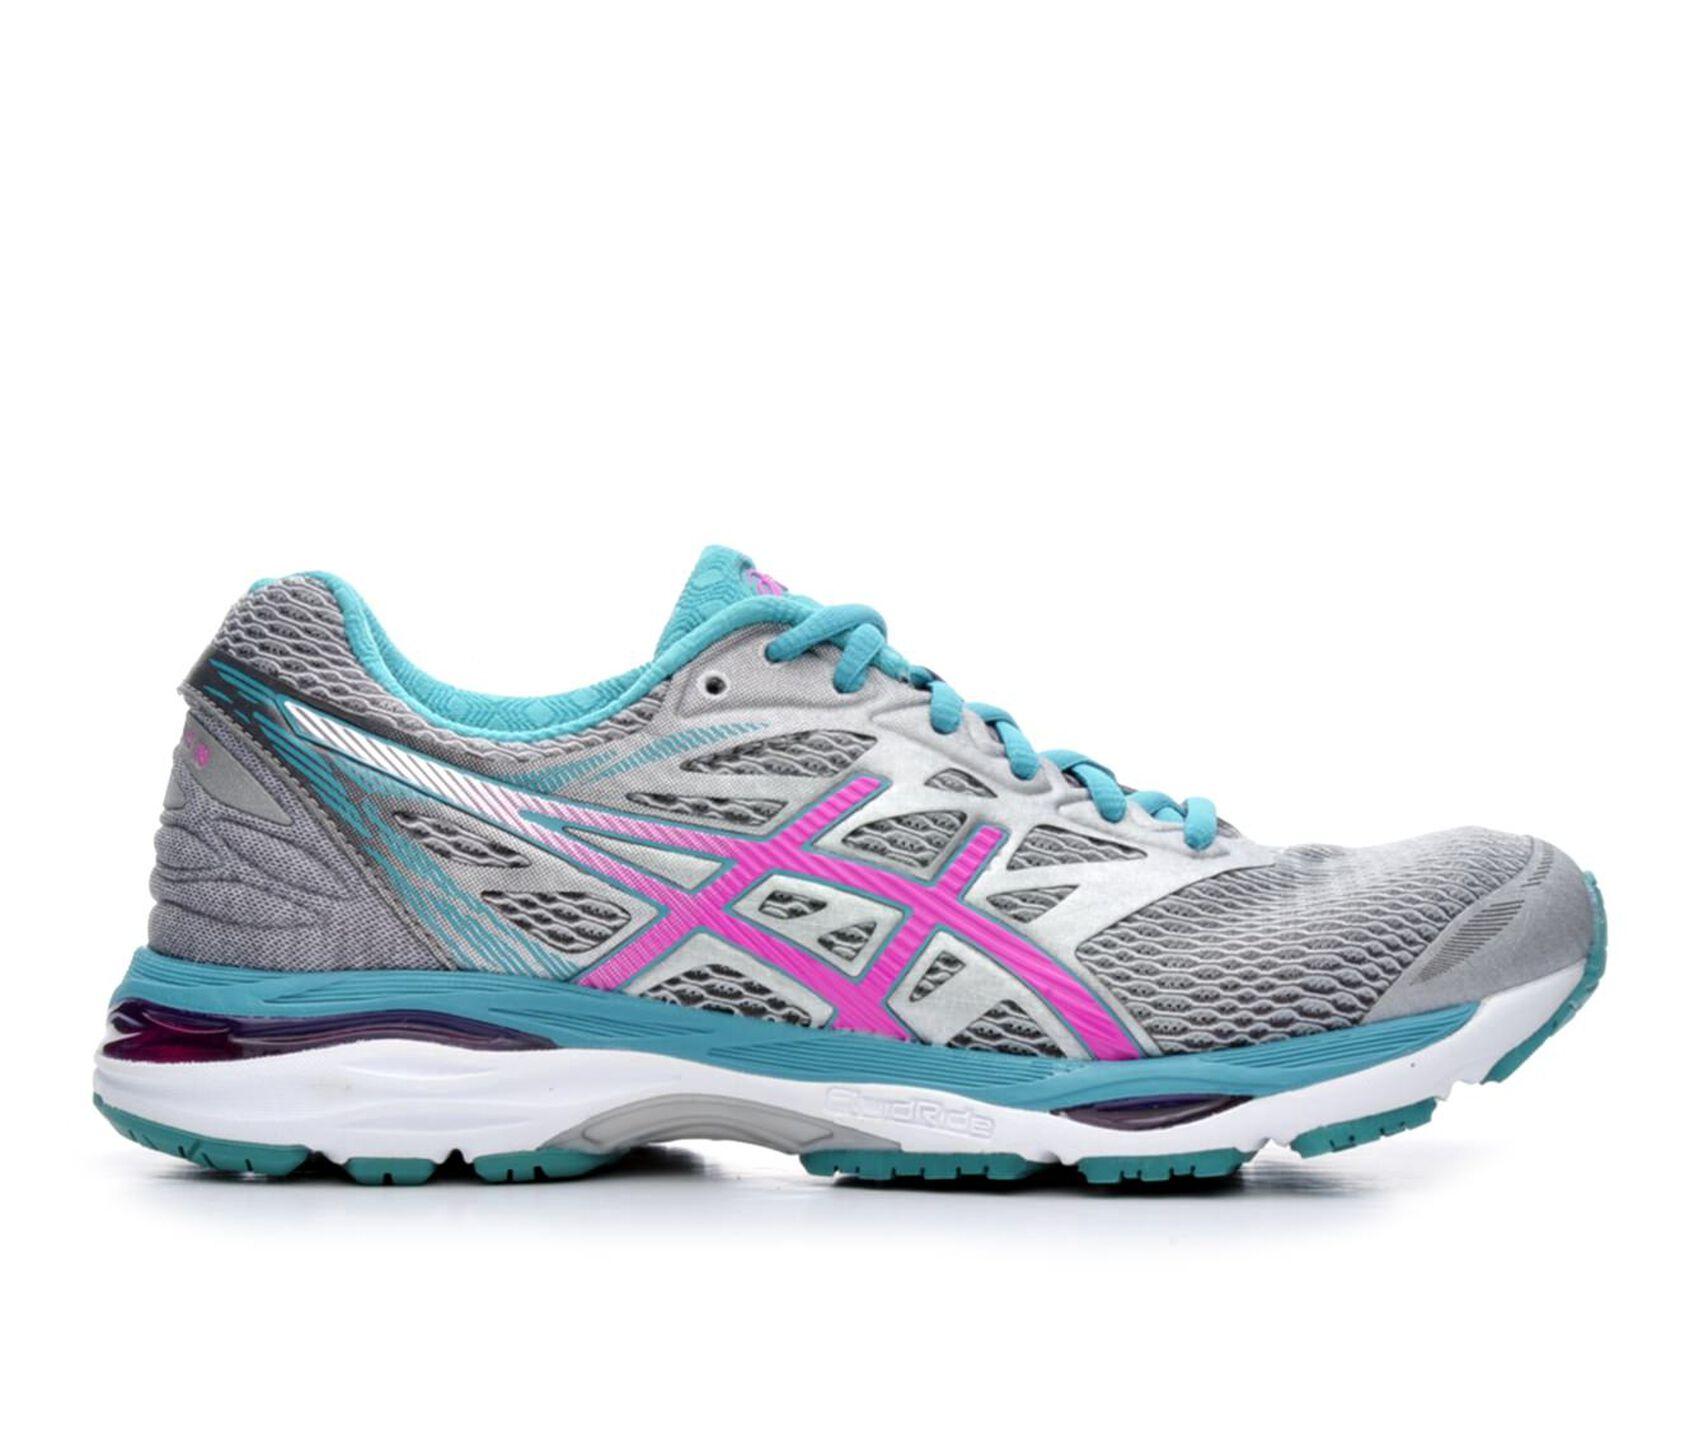 promo code 0d1c7 c5f2e Women's ASICS Gel Cumulus 18 Running Shoes